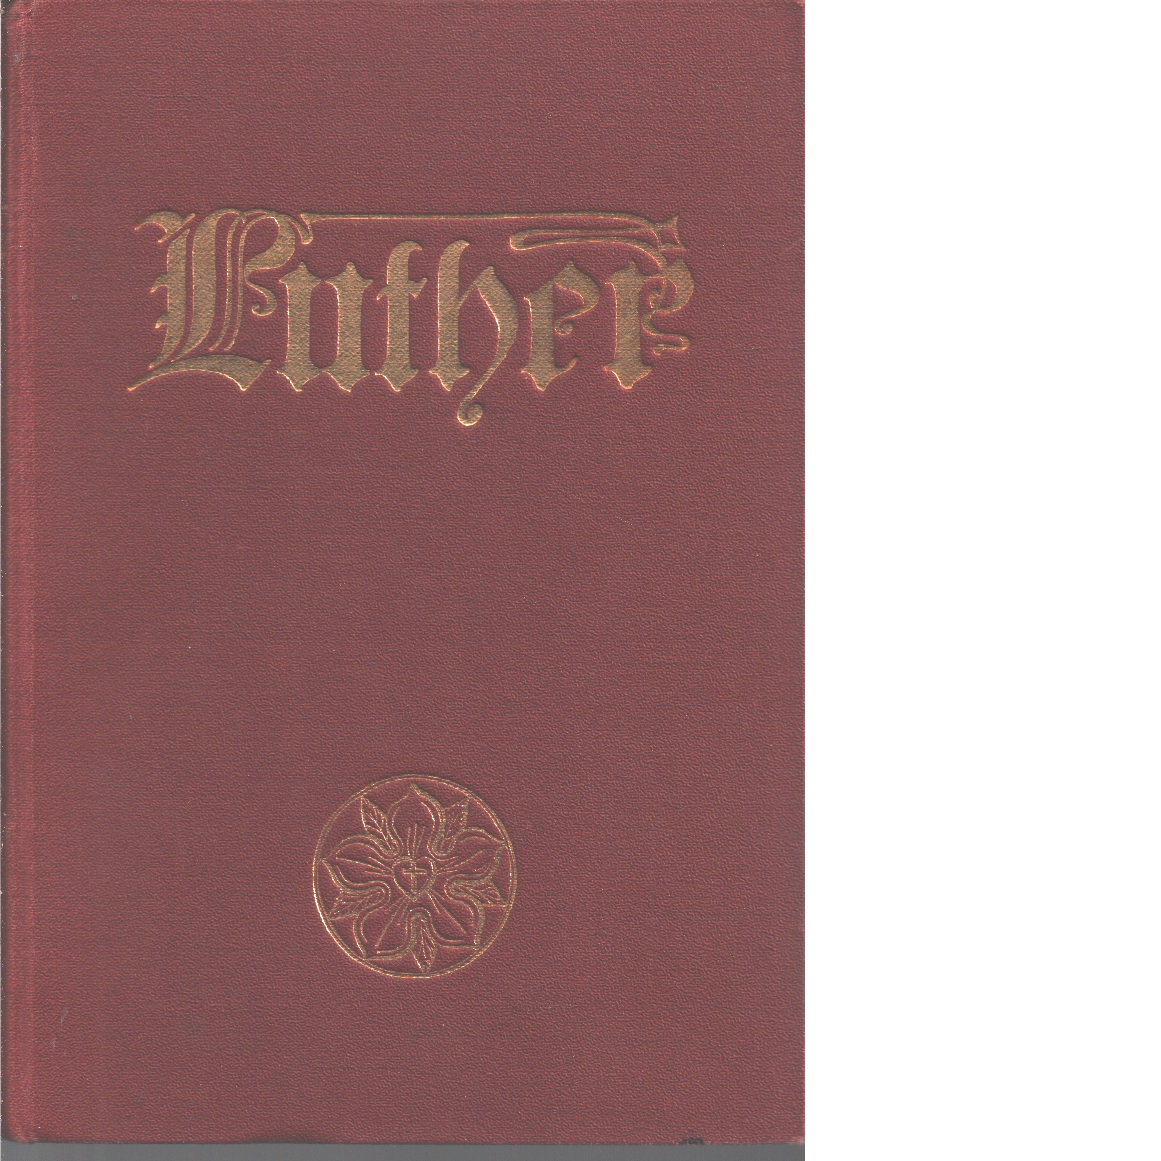 Luther : en livsbild - Scheffer, Henrika